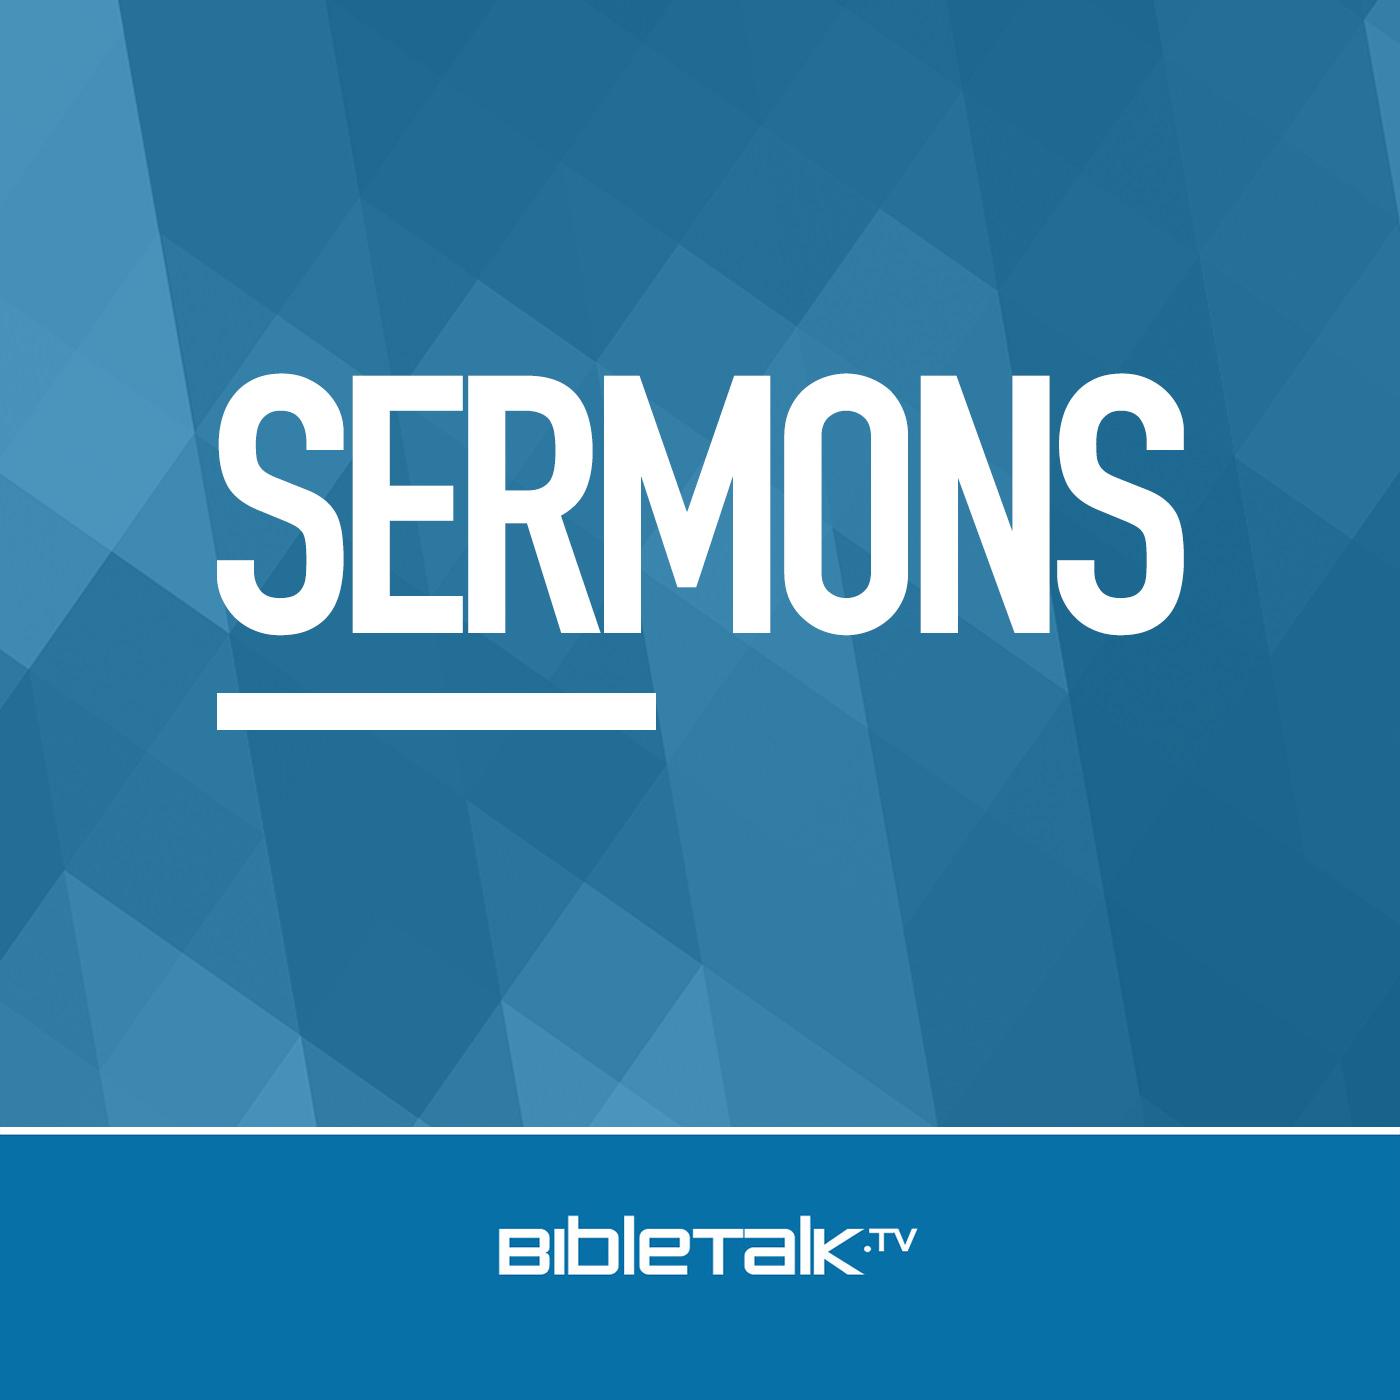 <![CDATA[Sermon Series | BibleTalk.tv]]>